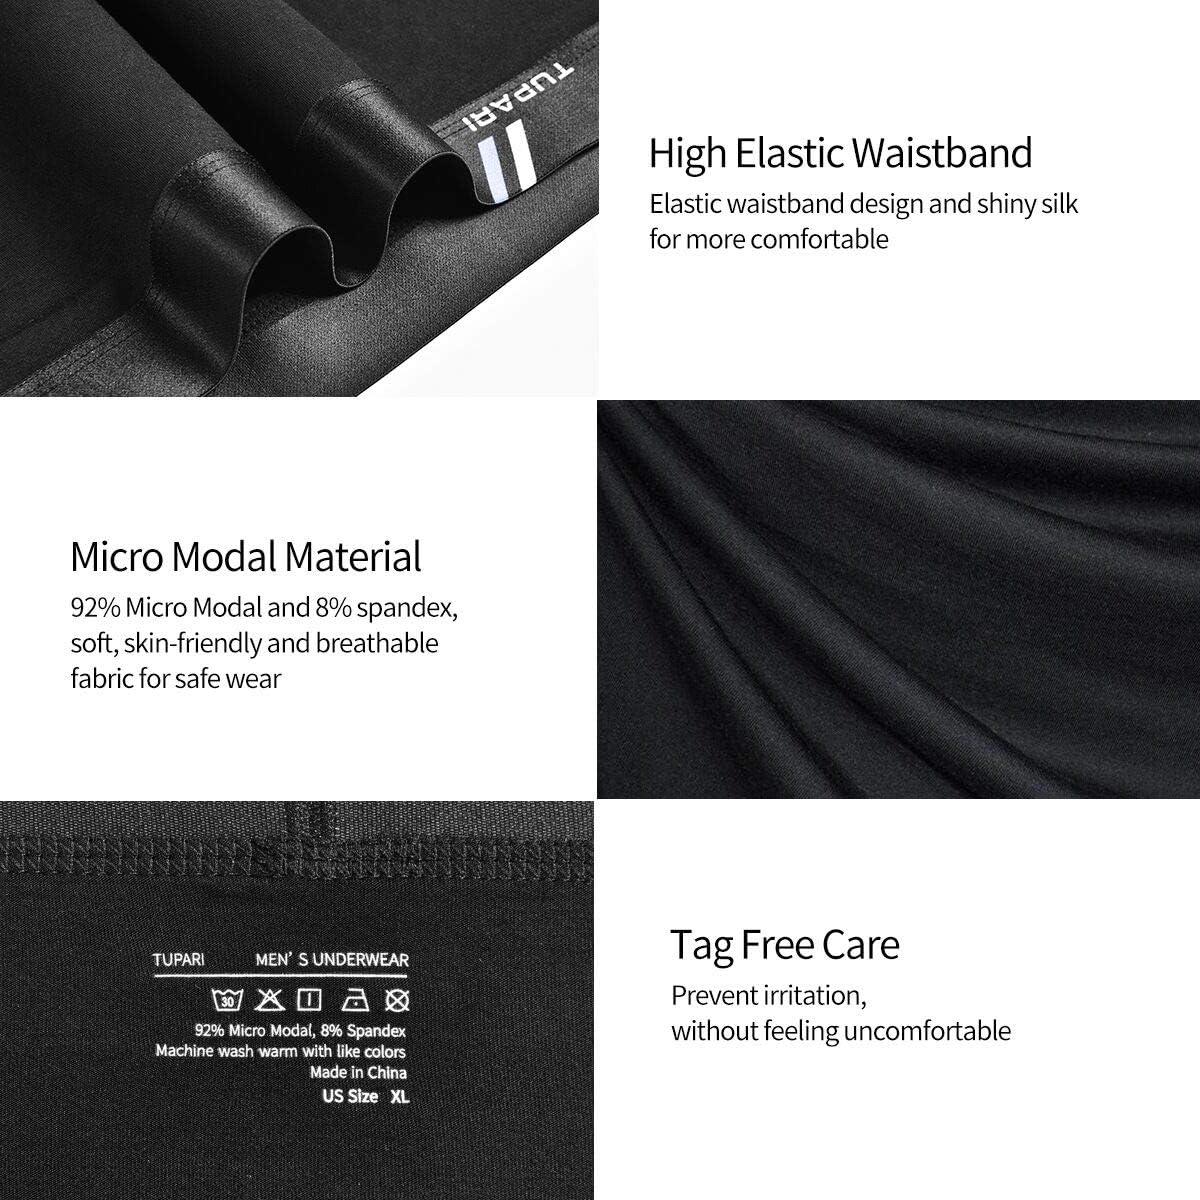 TUPARI Mens Boxer Briefs Underwear Soft Micro Modal Boxer Briefs for Men Pack Fly and Contour Pouch